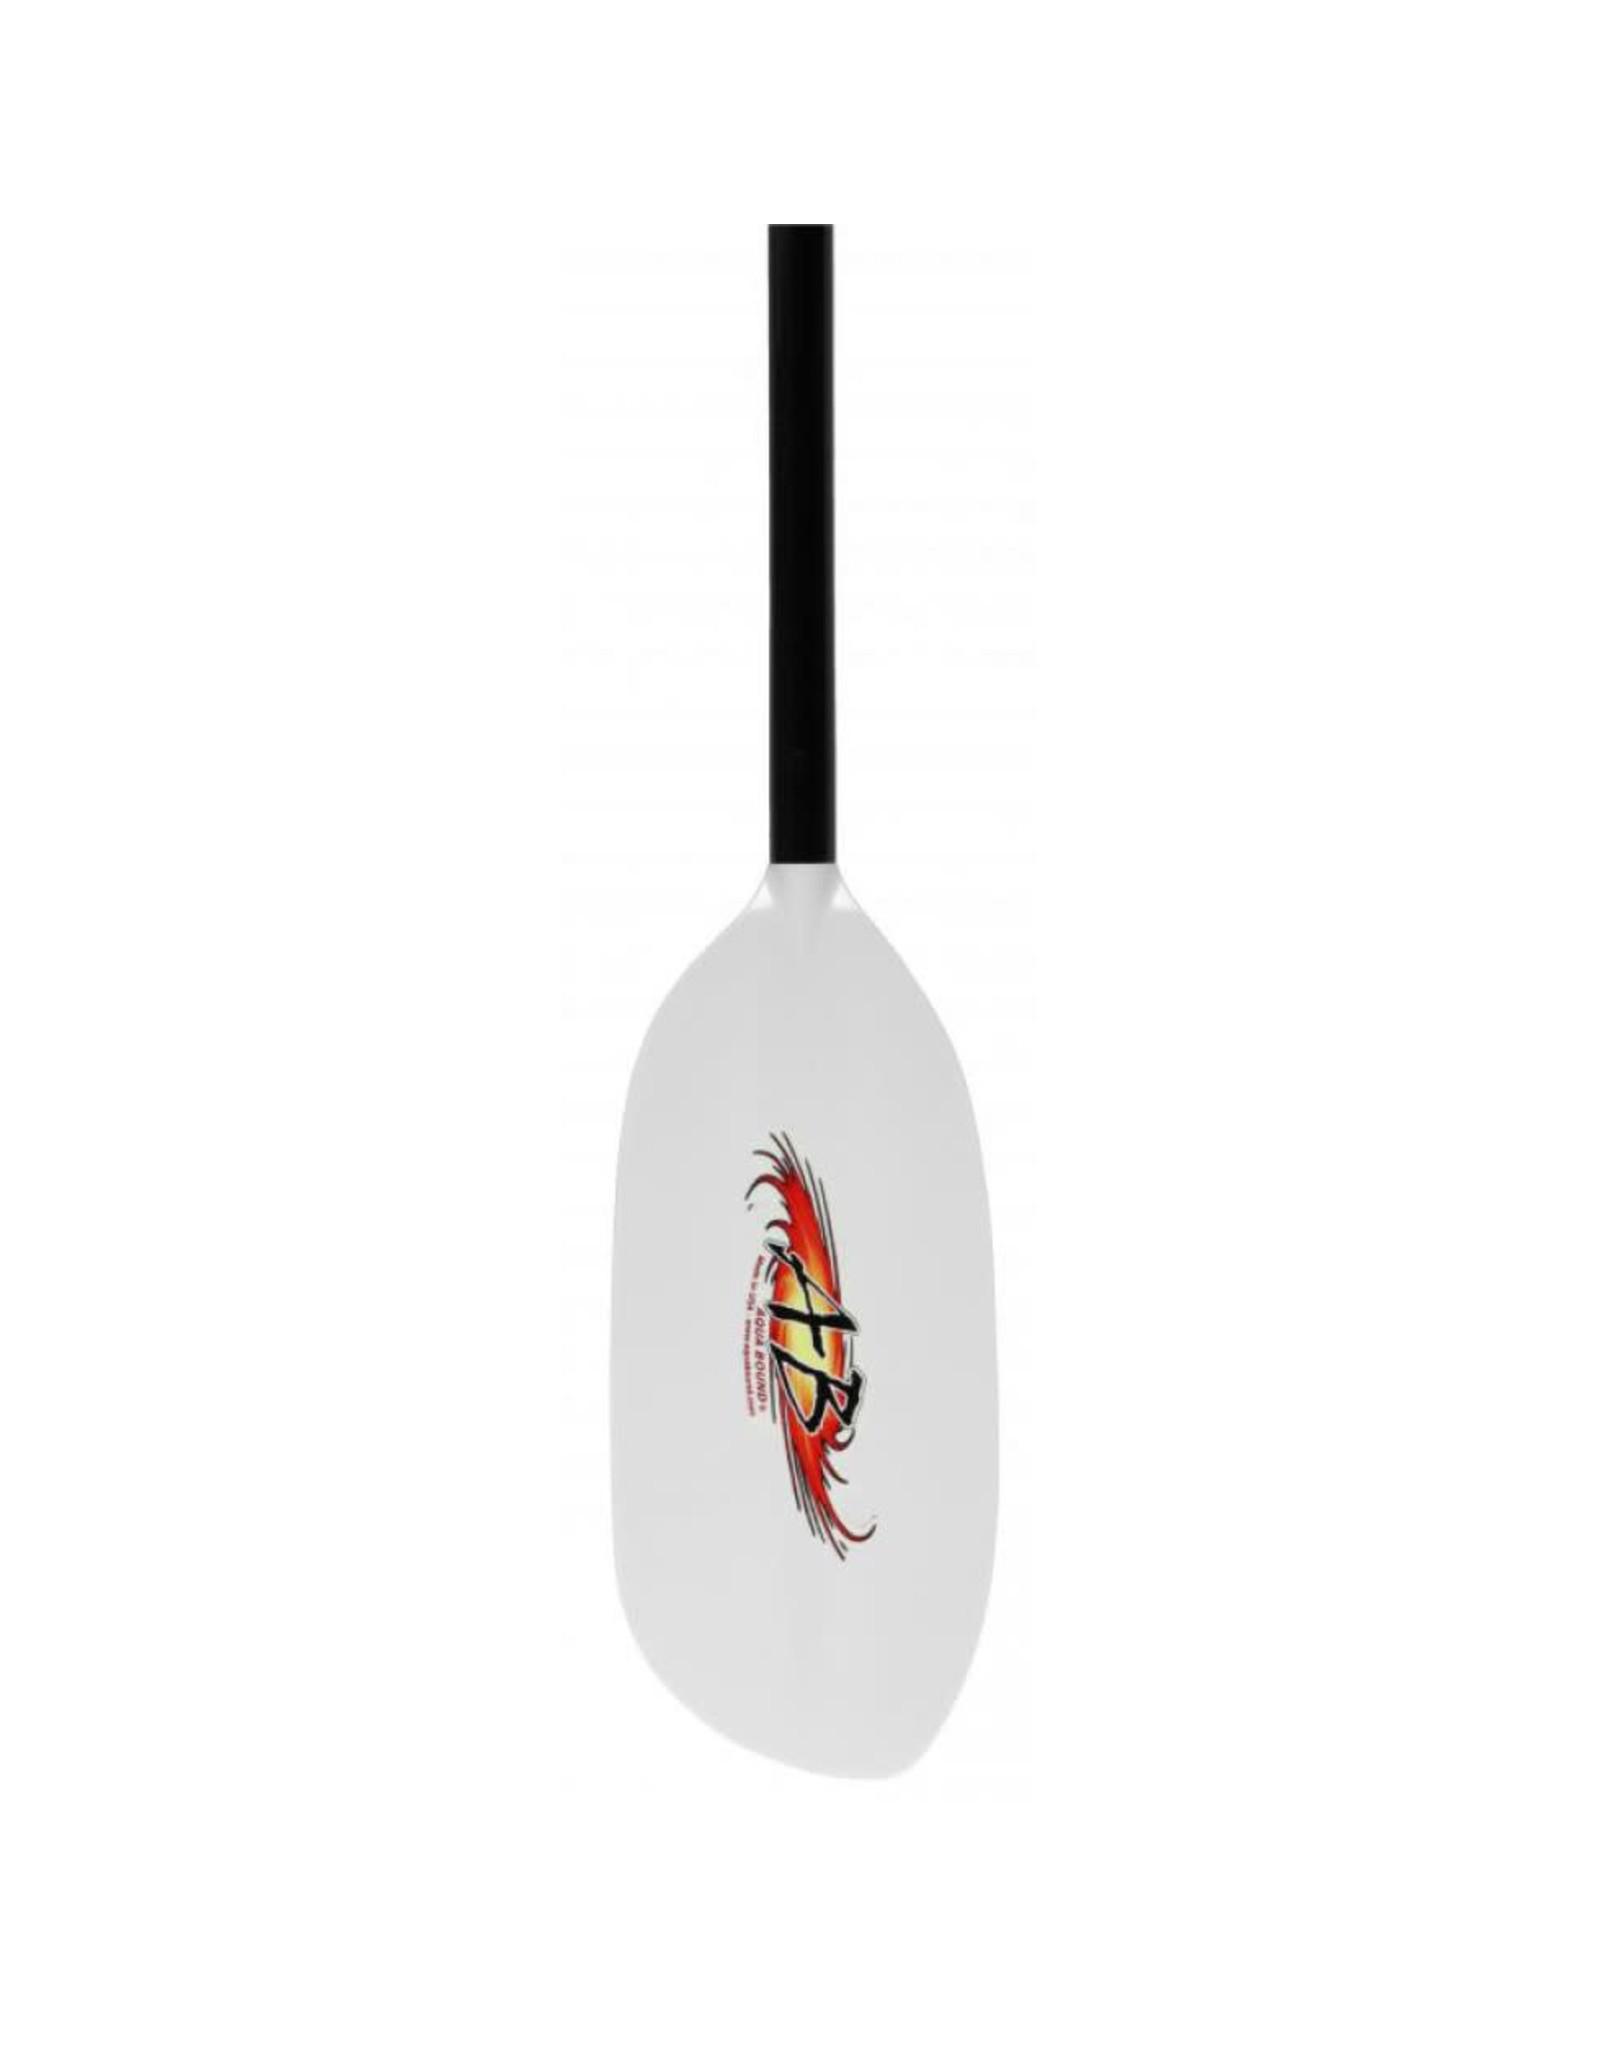 Aqua-Bound Aqua-Bound Shred Hybrid paddle